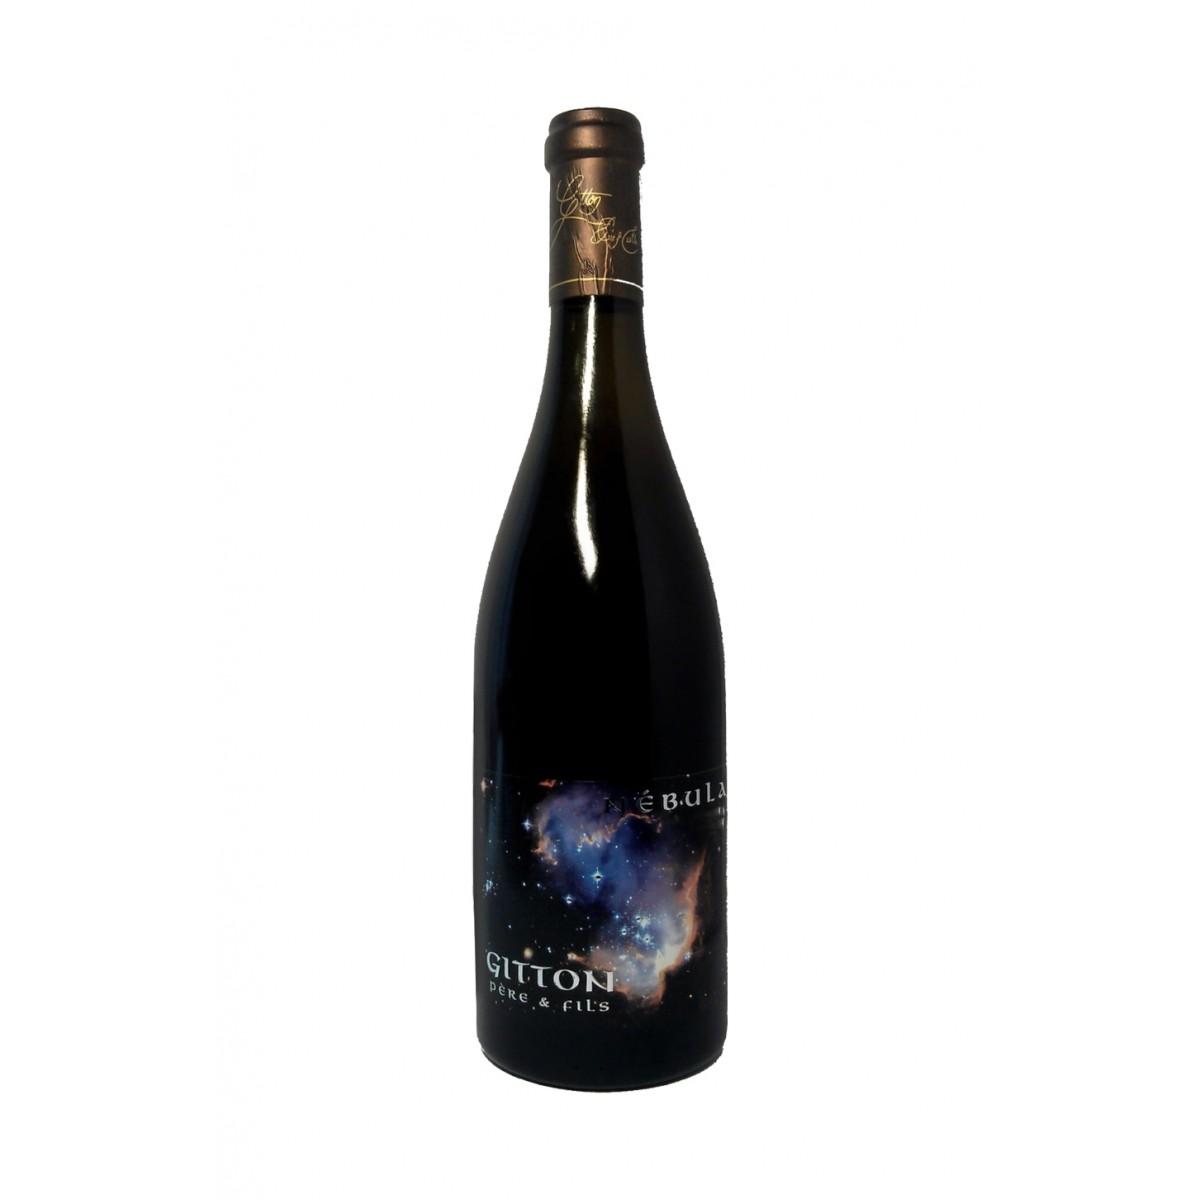 Pouilly-Fumé Nebula 2015 - Gitton Père et Fils